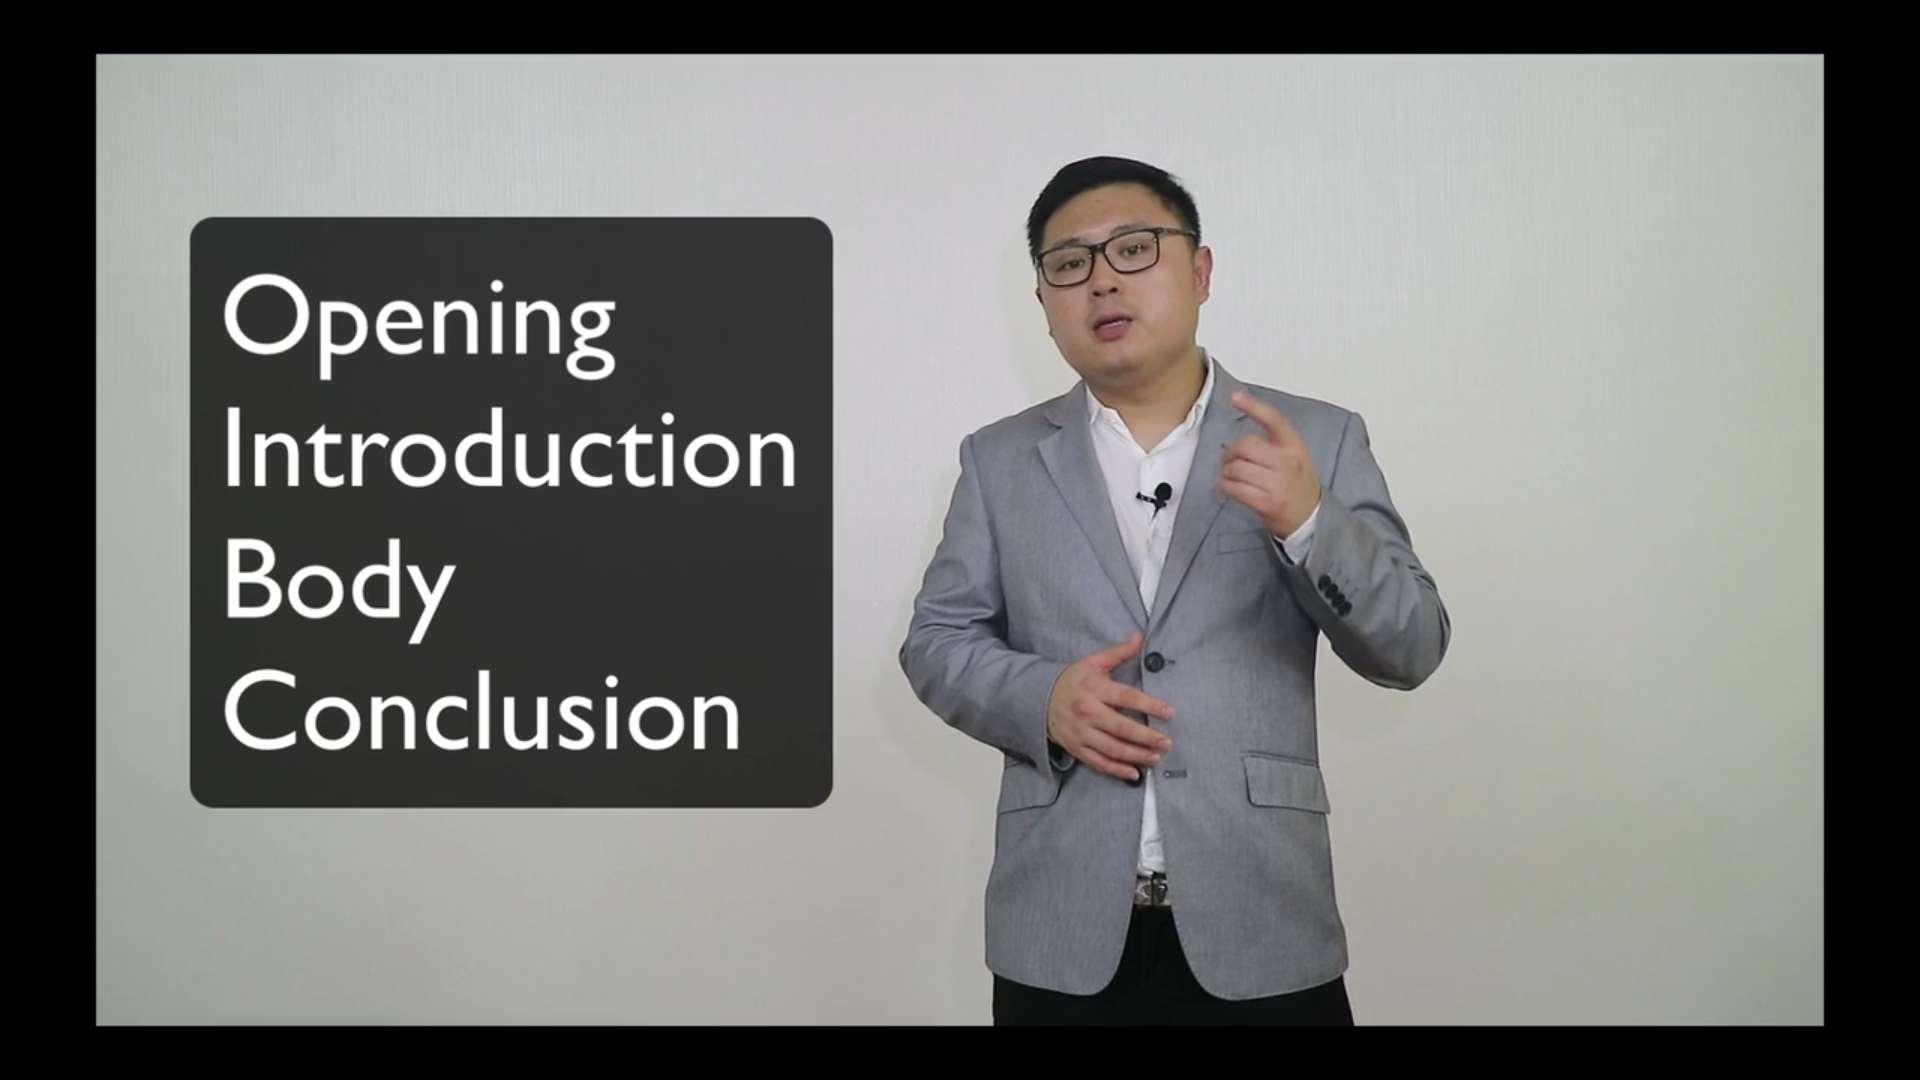 9. Presentation Flow